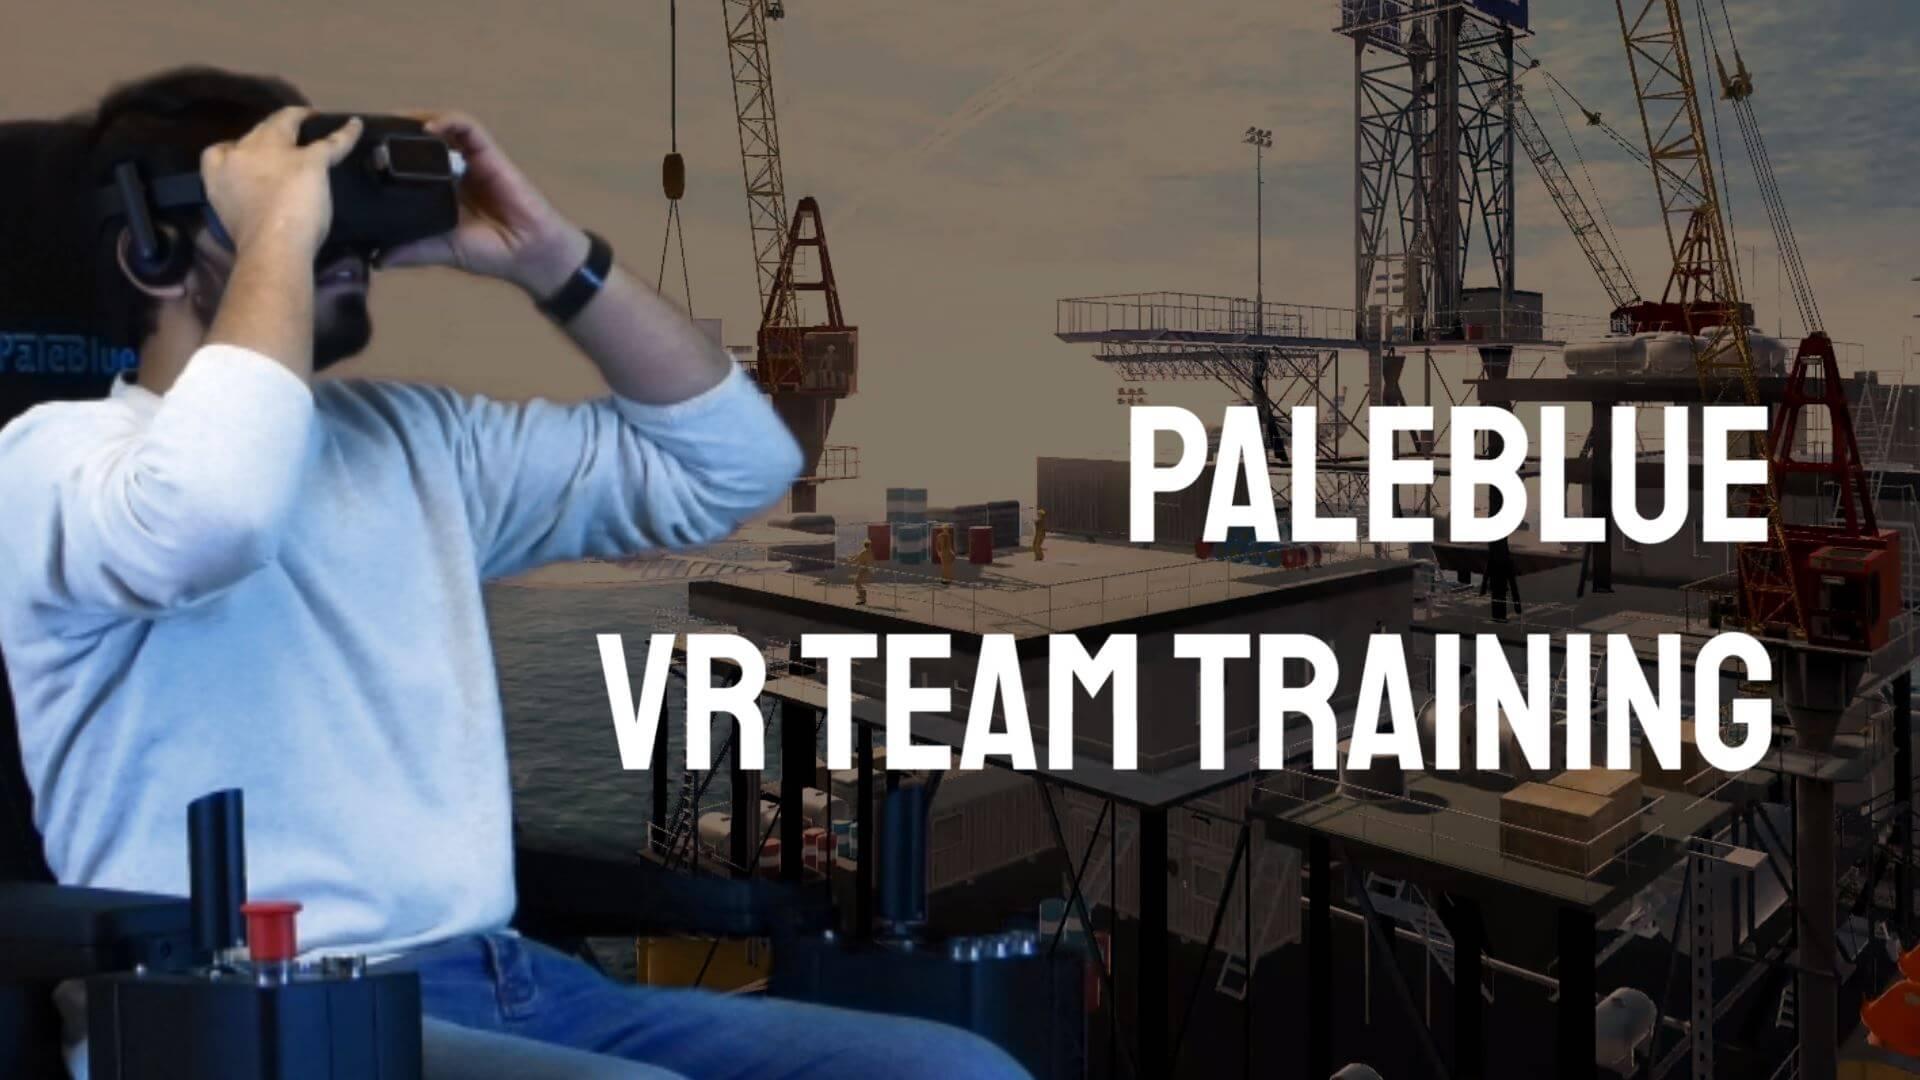 PaleBlue Launches VR Full Team Training